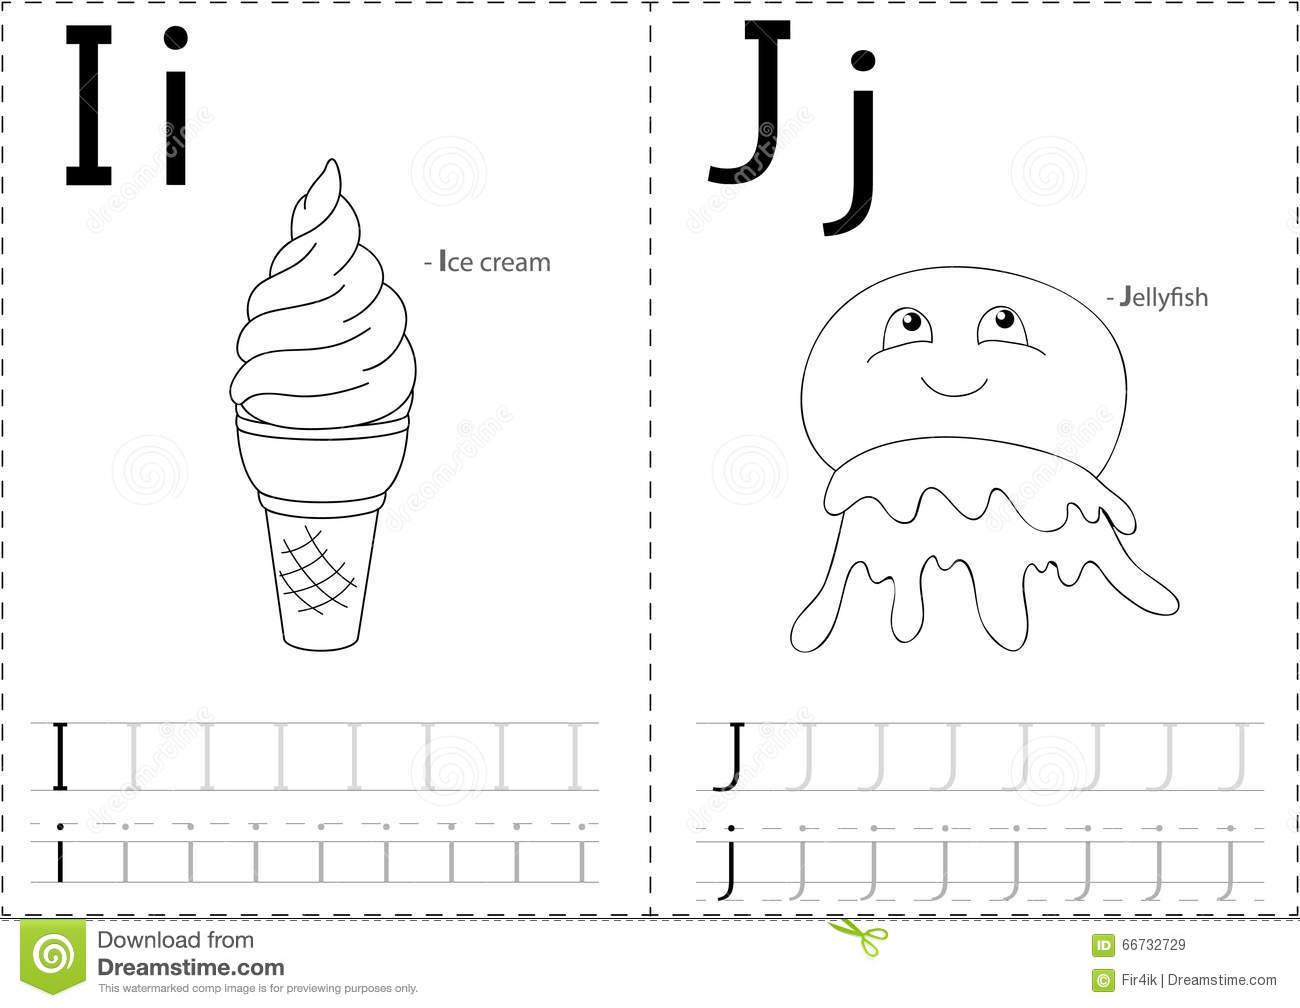 Cartoon Ice Cream And Jellyfish  Alphabet Tracing Worksheet  Wri